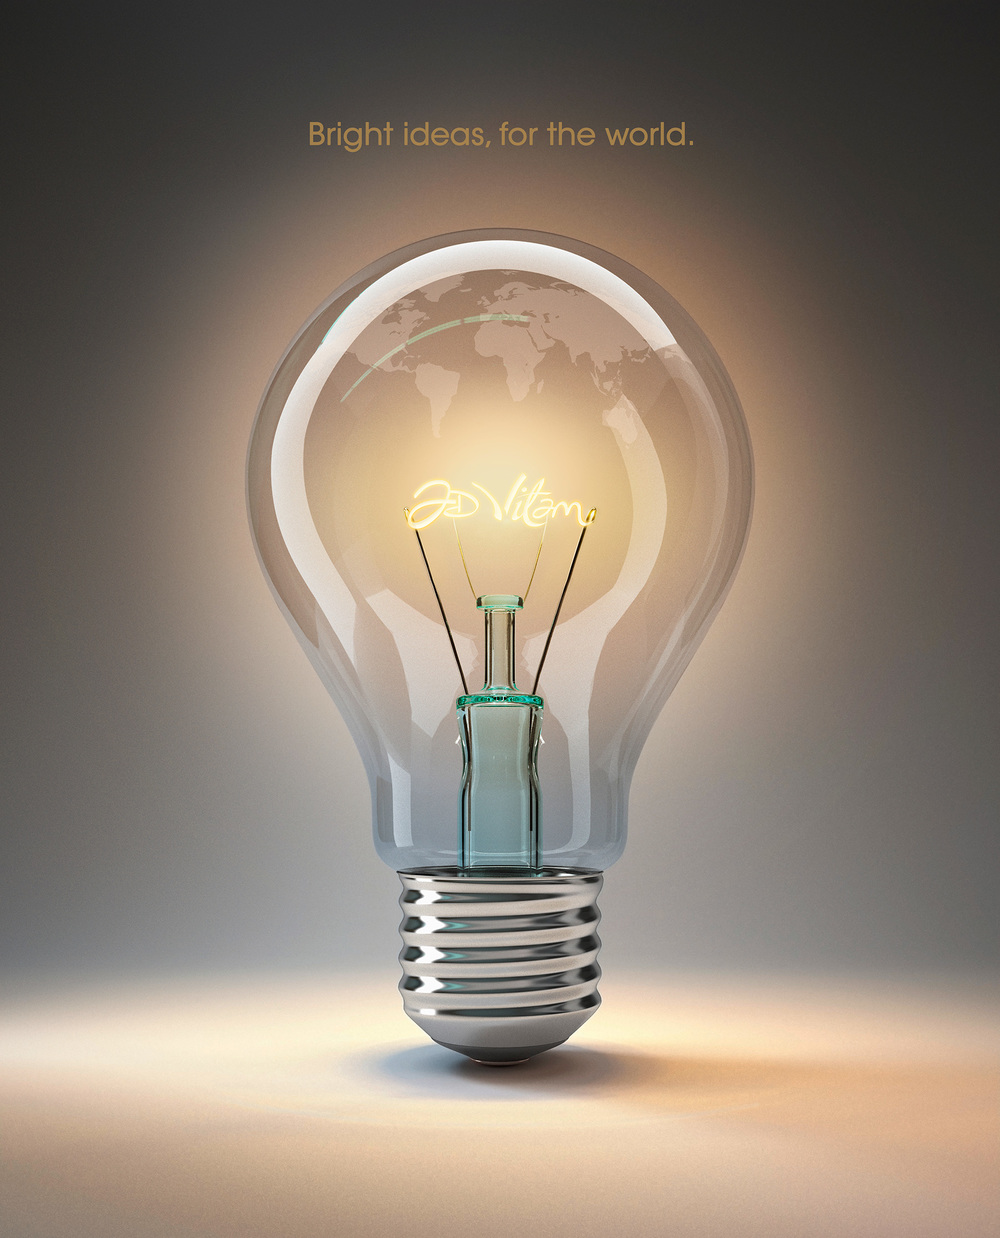 Ad-Vitam-bulb.jpg